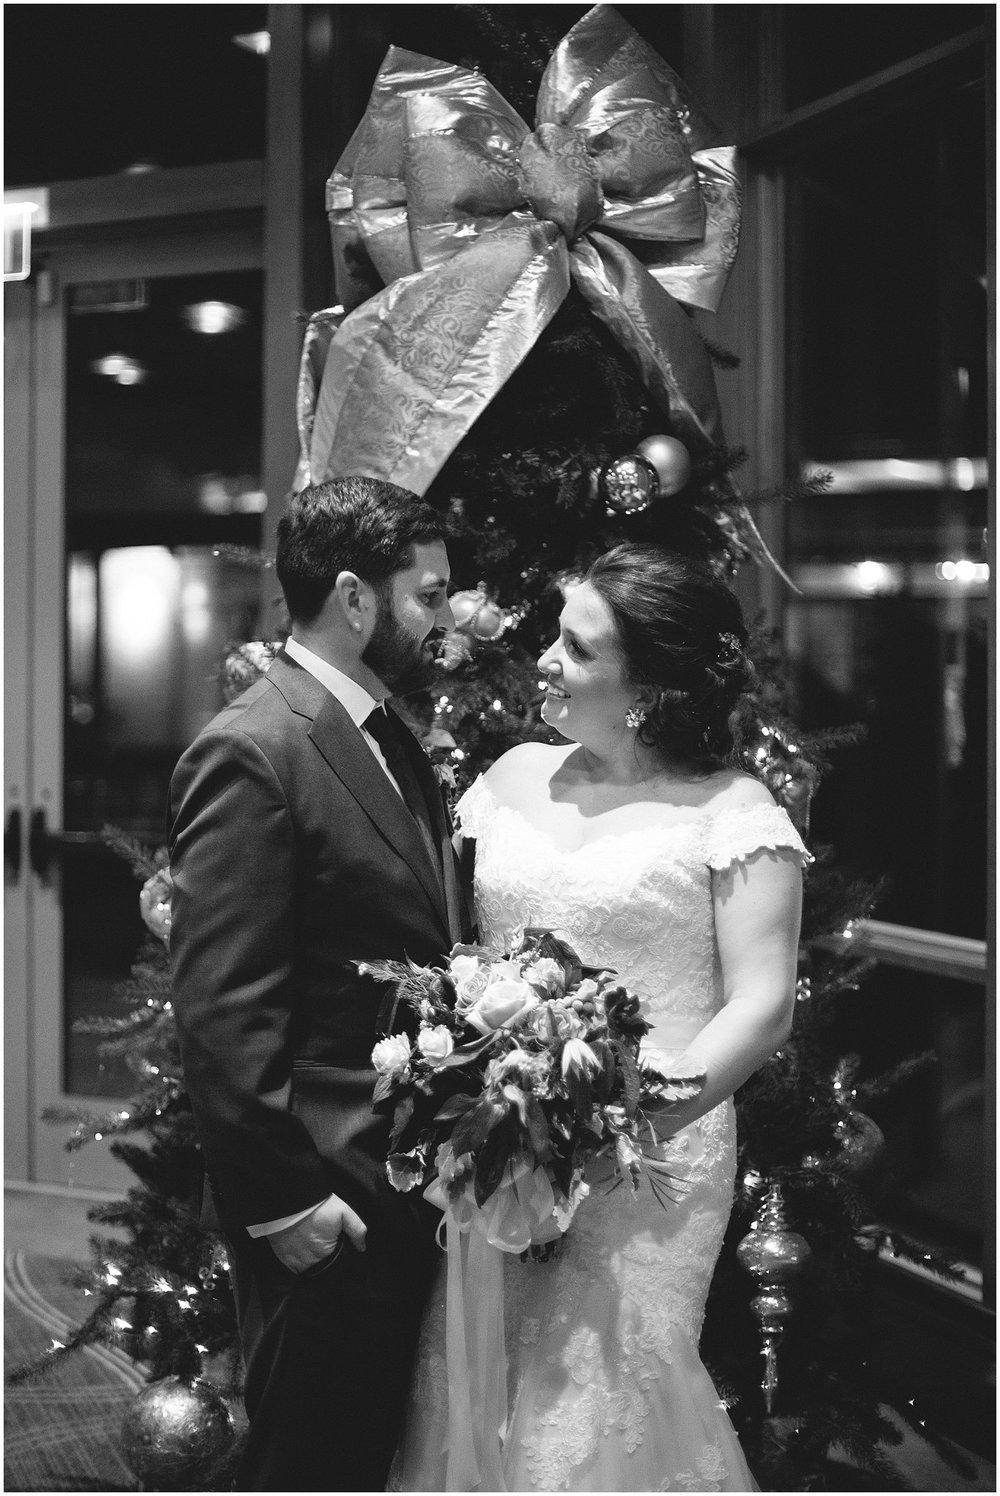 Hyatt-Lodge-Mcdonald-Campus-Wedding_0061.jpg